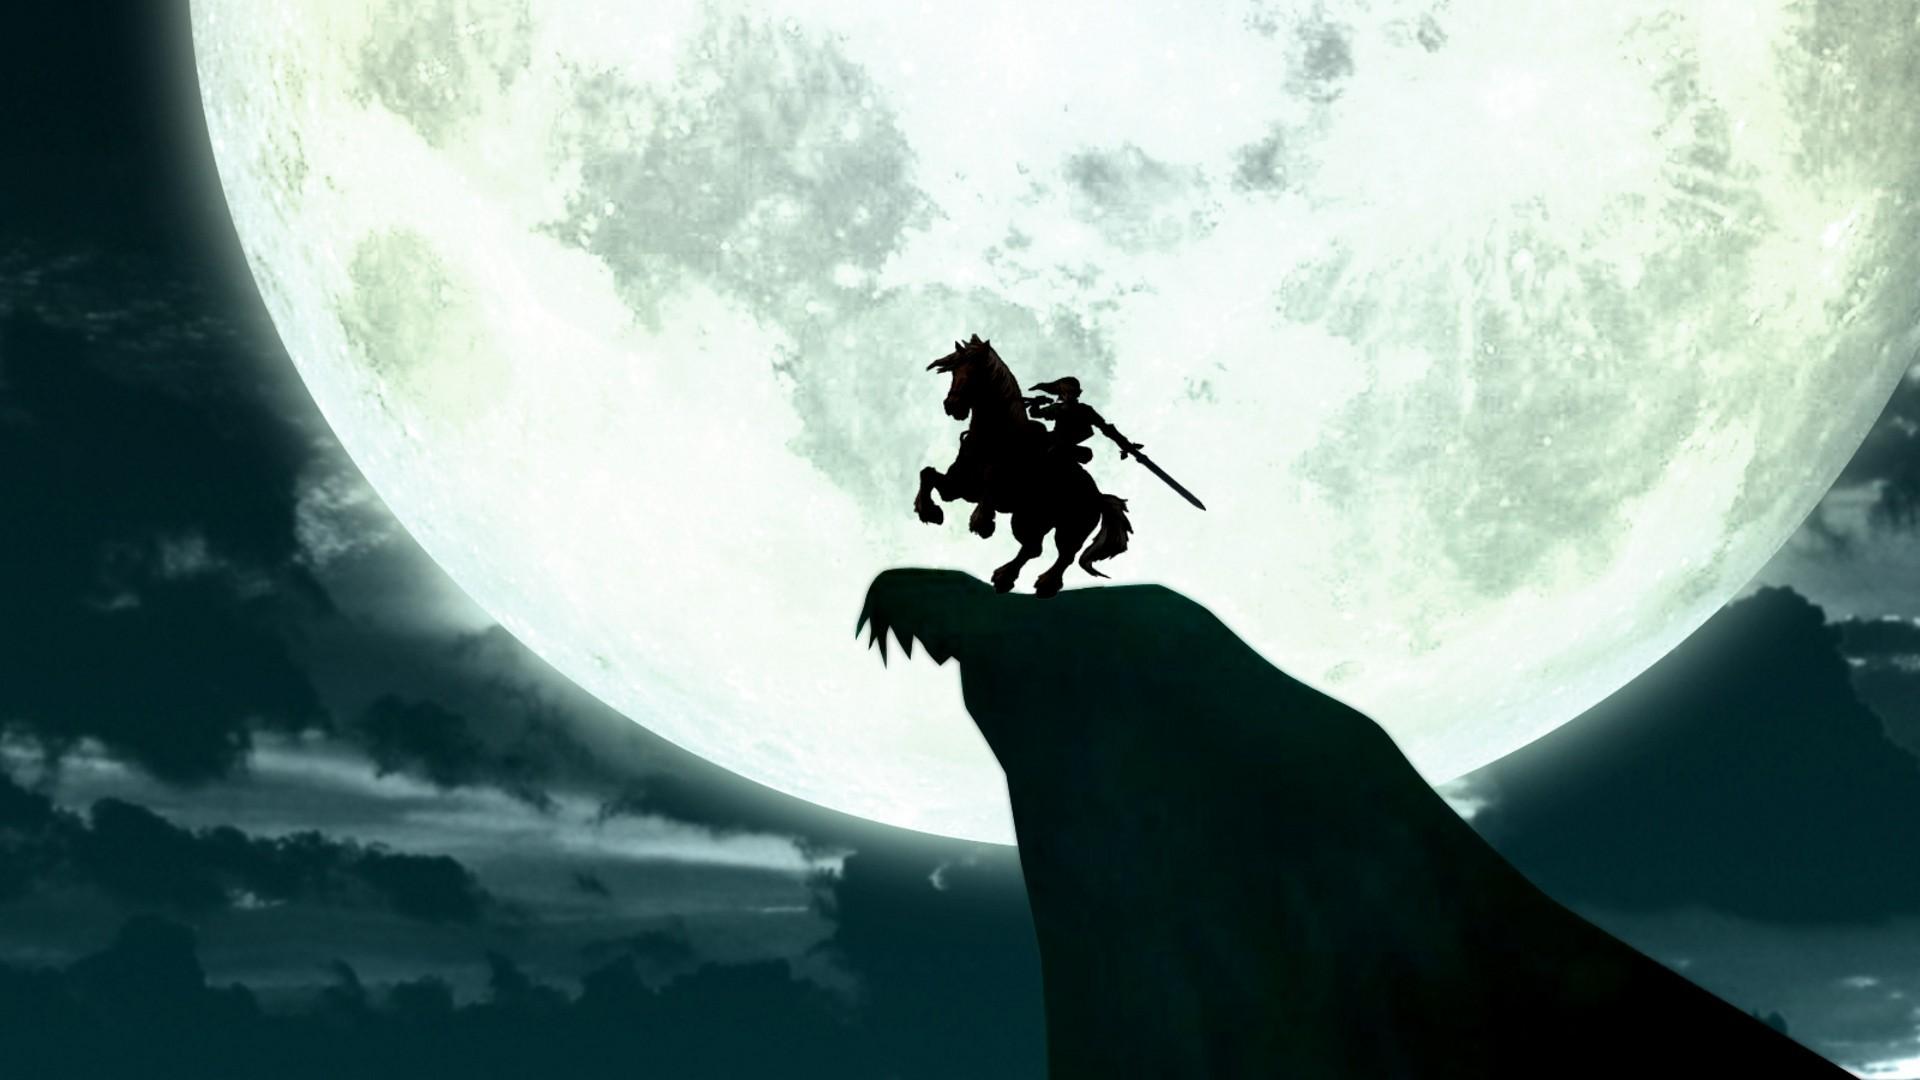 塞尔达传说:荒野之息(The Legend of Zelda: Breath of the Wild)插图4